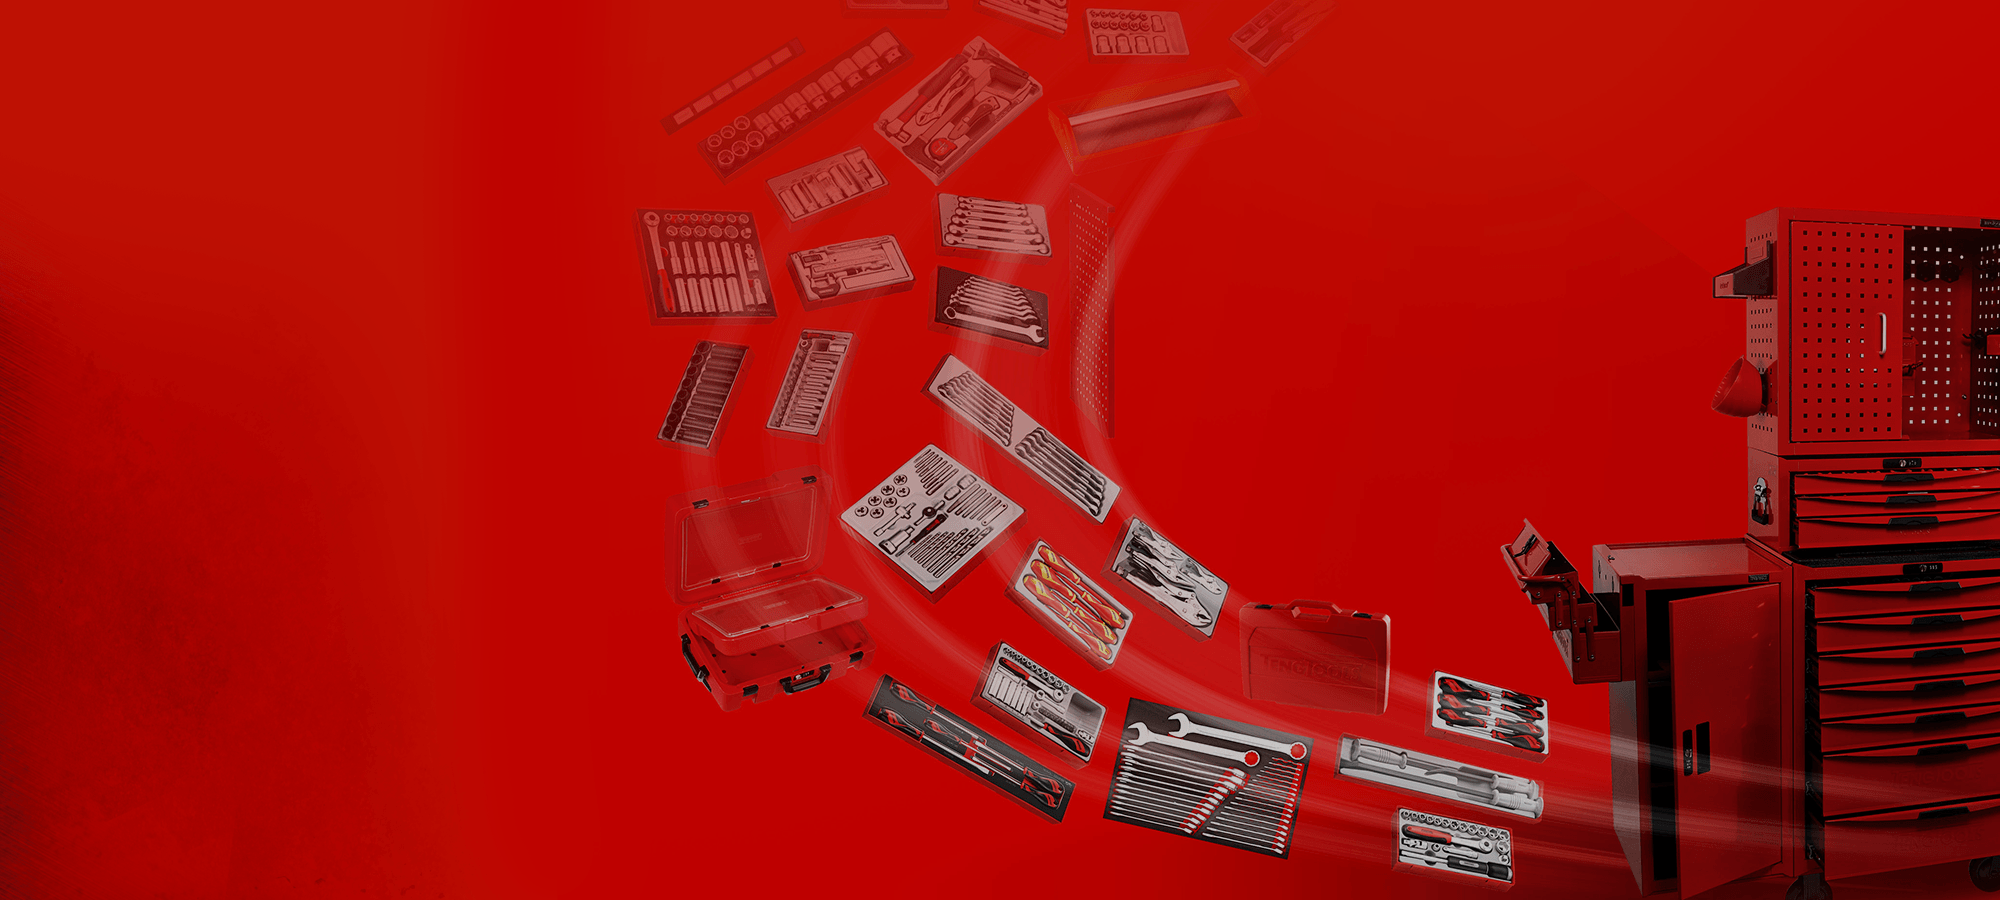 Teng Tools background image